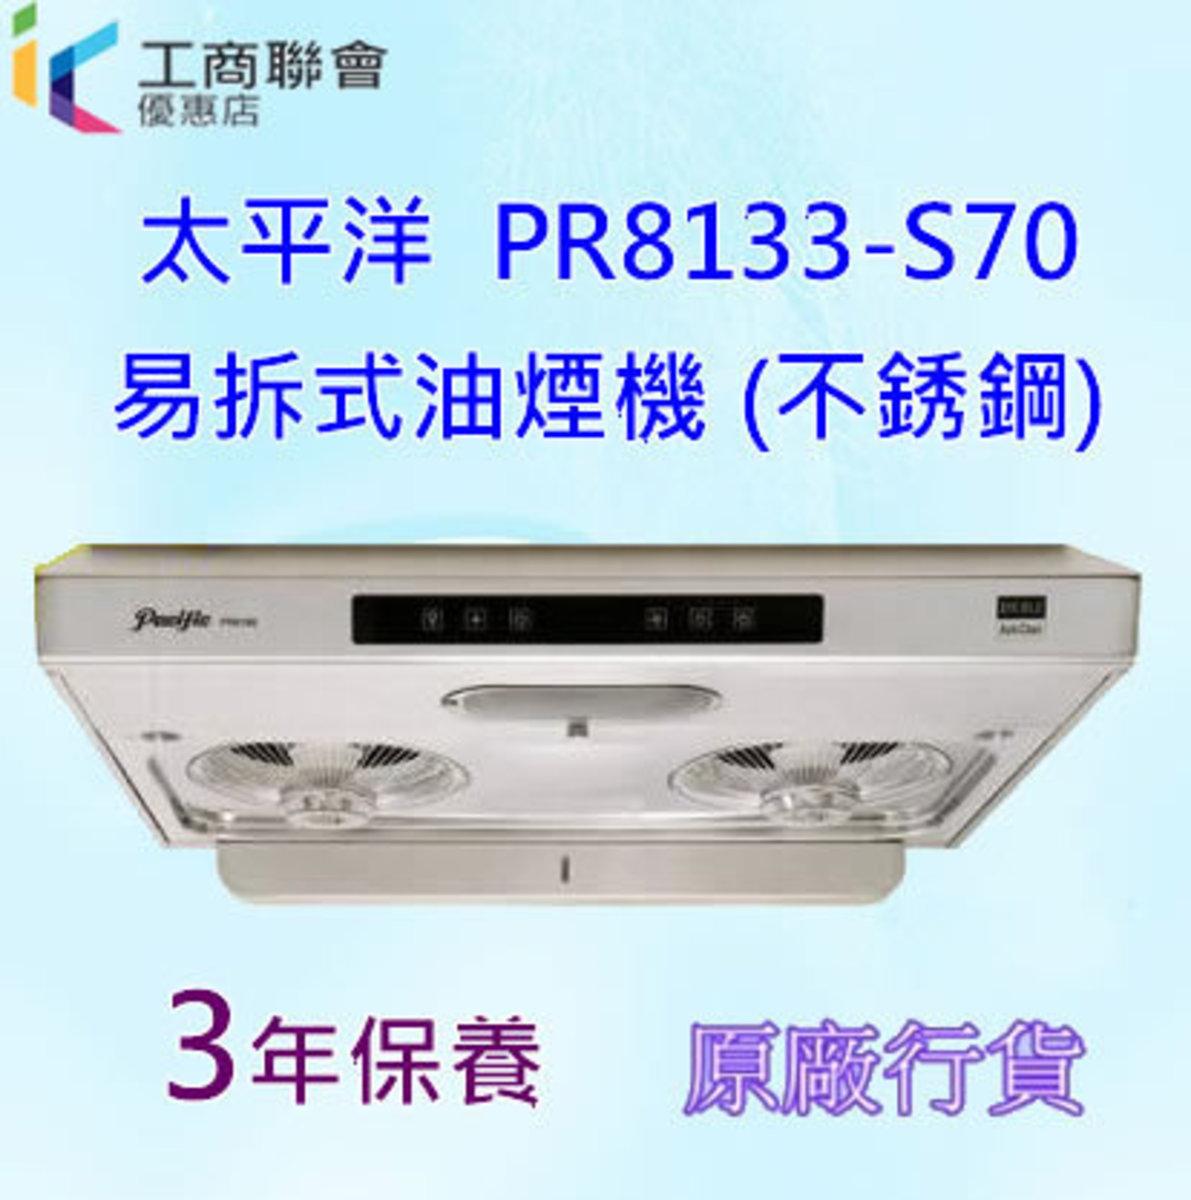 PR8133 S70 易拆式油煙機 (不銹鋼)